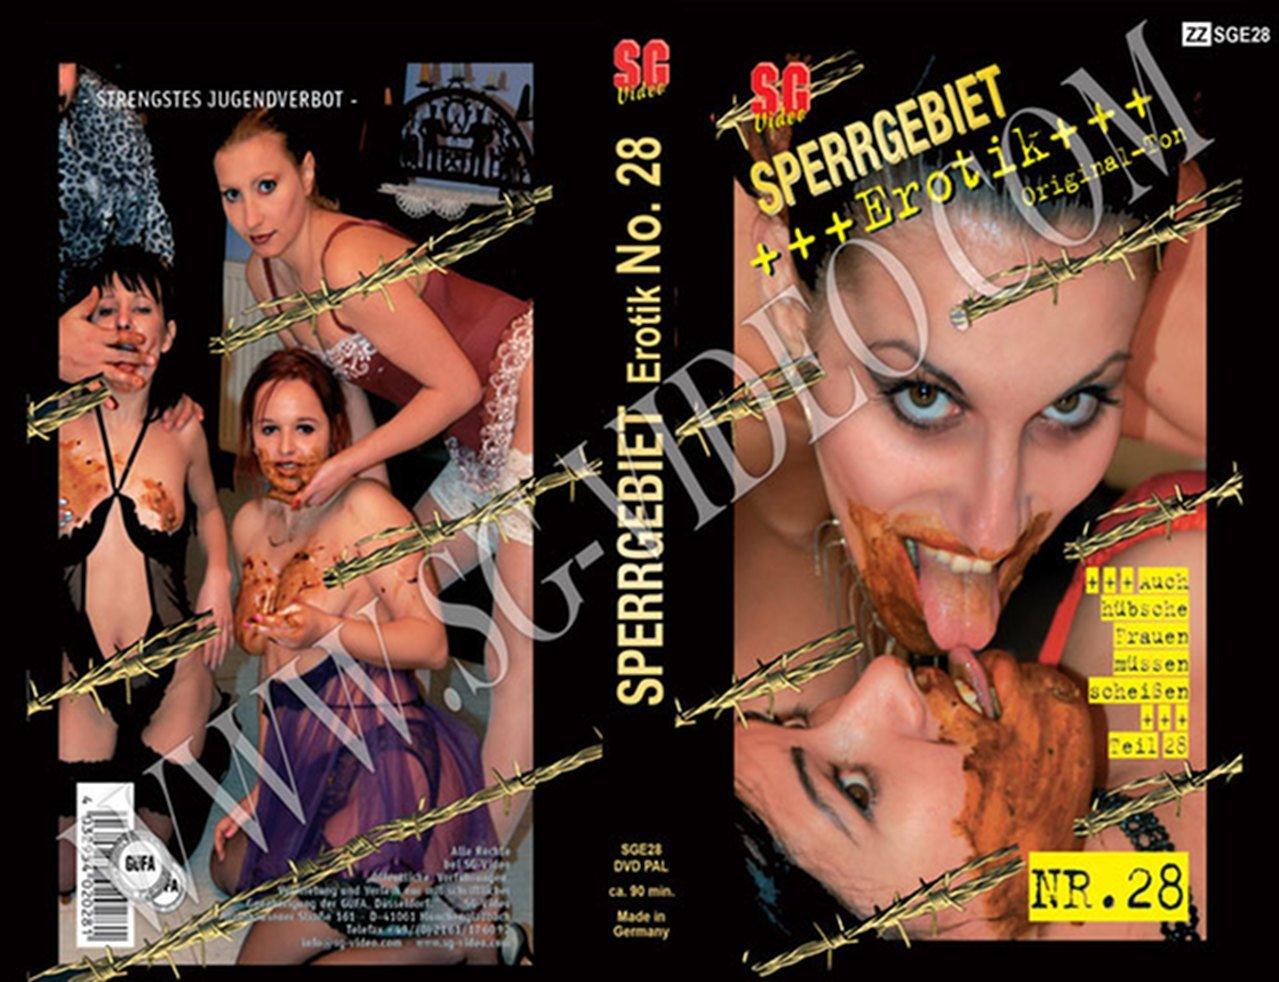 Sperrgebiet Erotik 28 - FULL MOVIE (Reda, Tima, Silvia, Natasha, Roland, Linda)